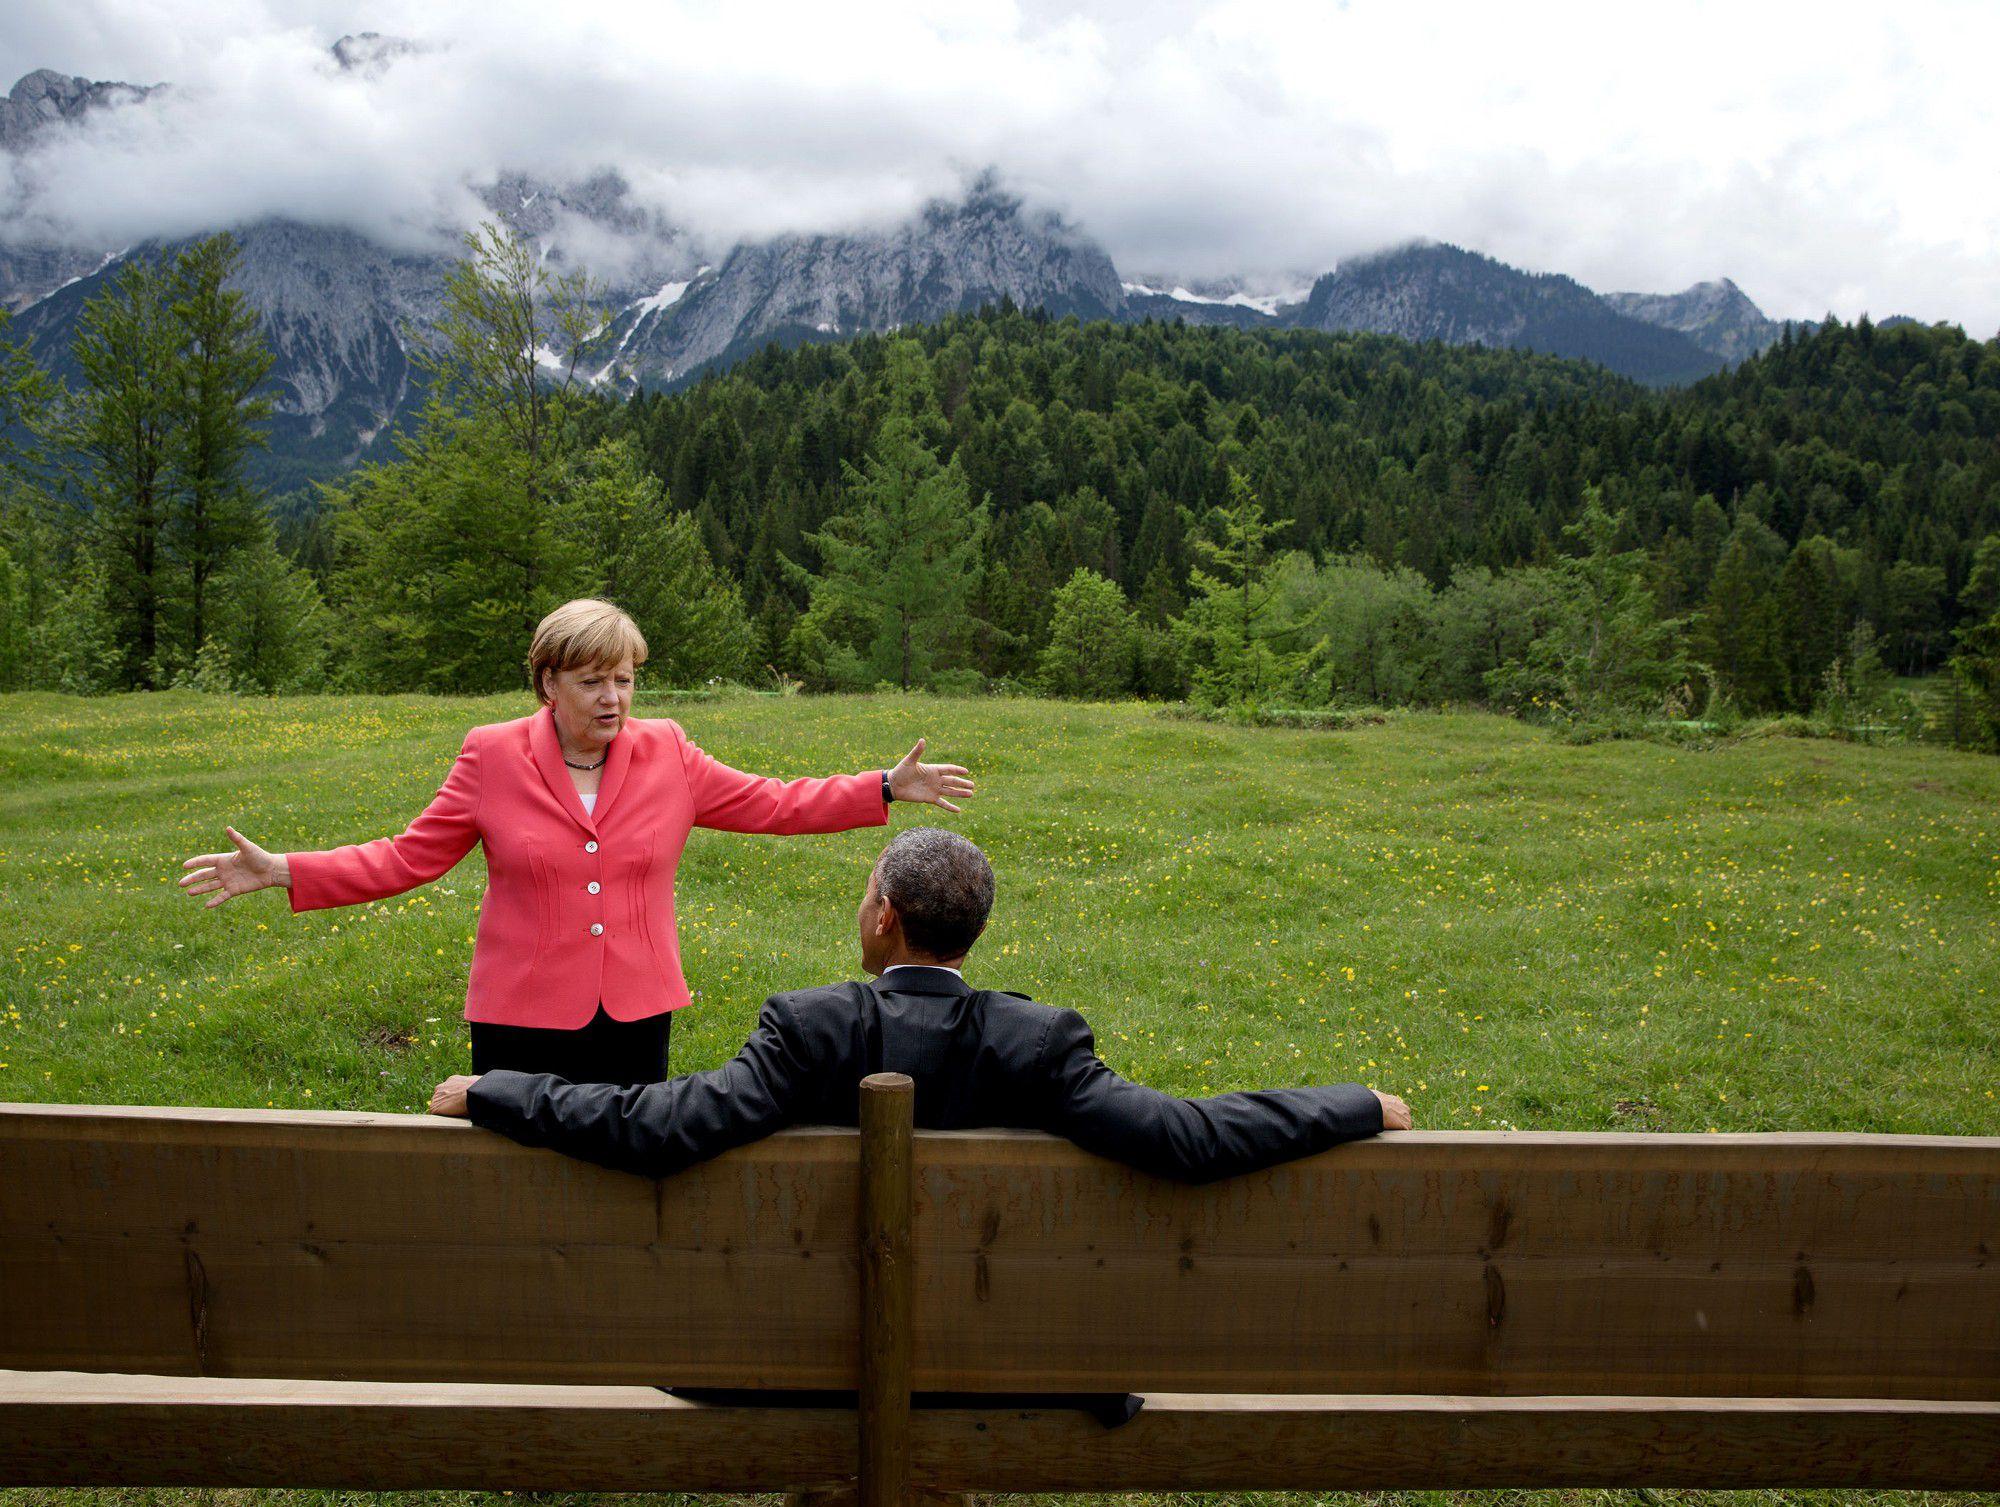 Pete Souza: Barack Obama and Angela Merkel talking at the 41st G7 summit -  CAMERA WORK